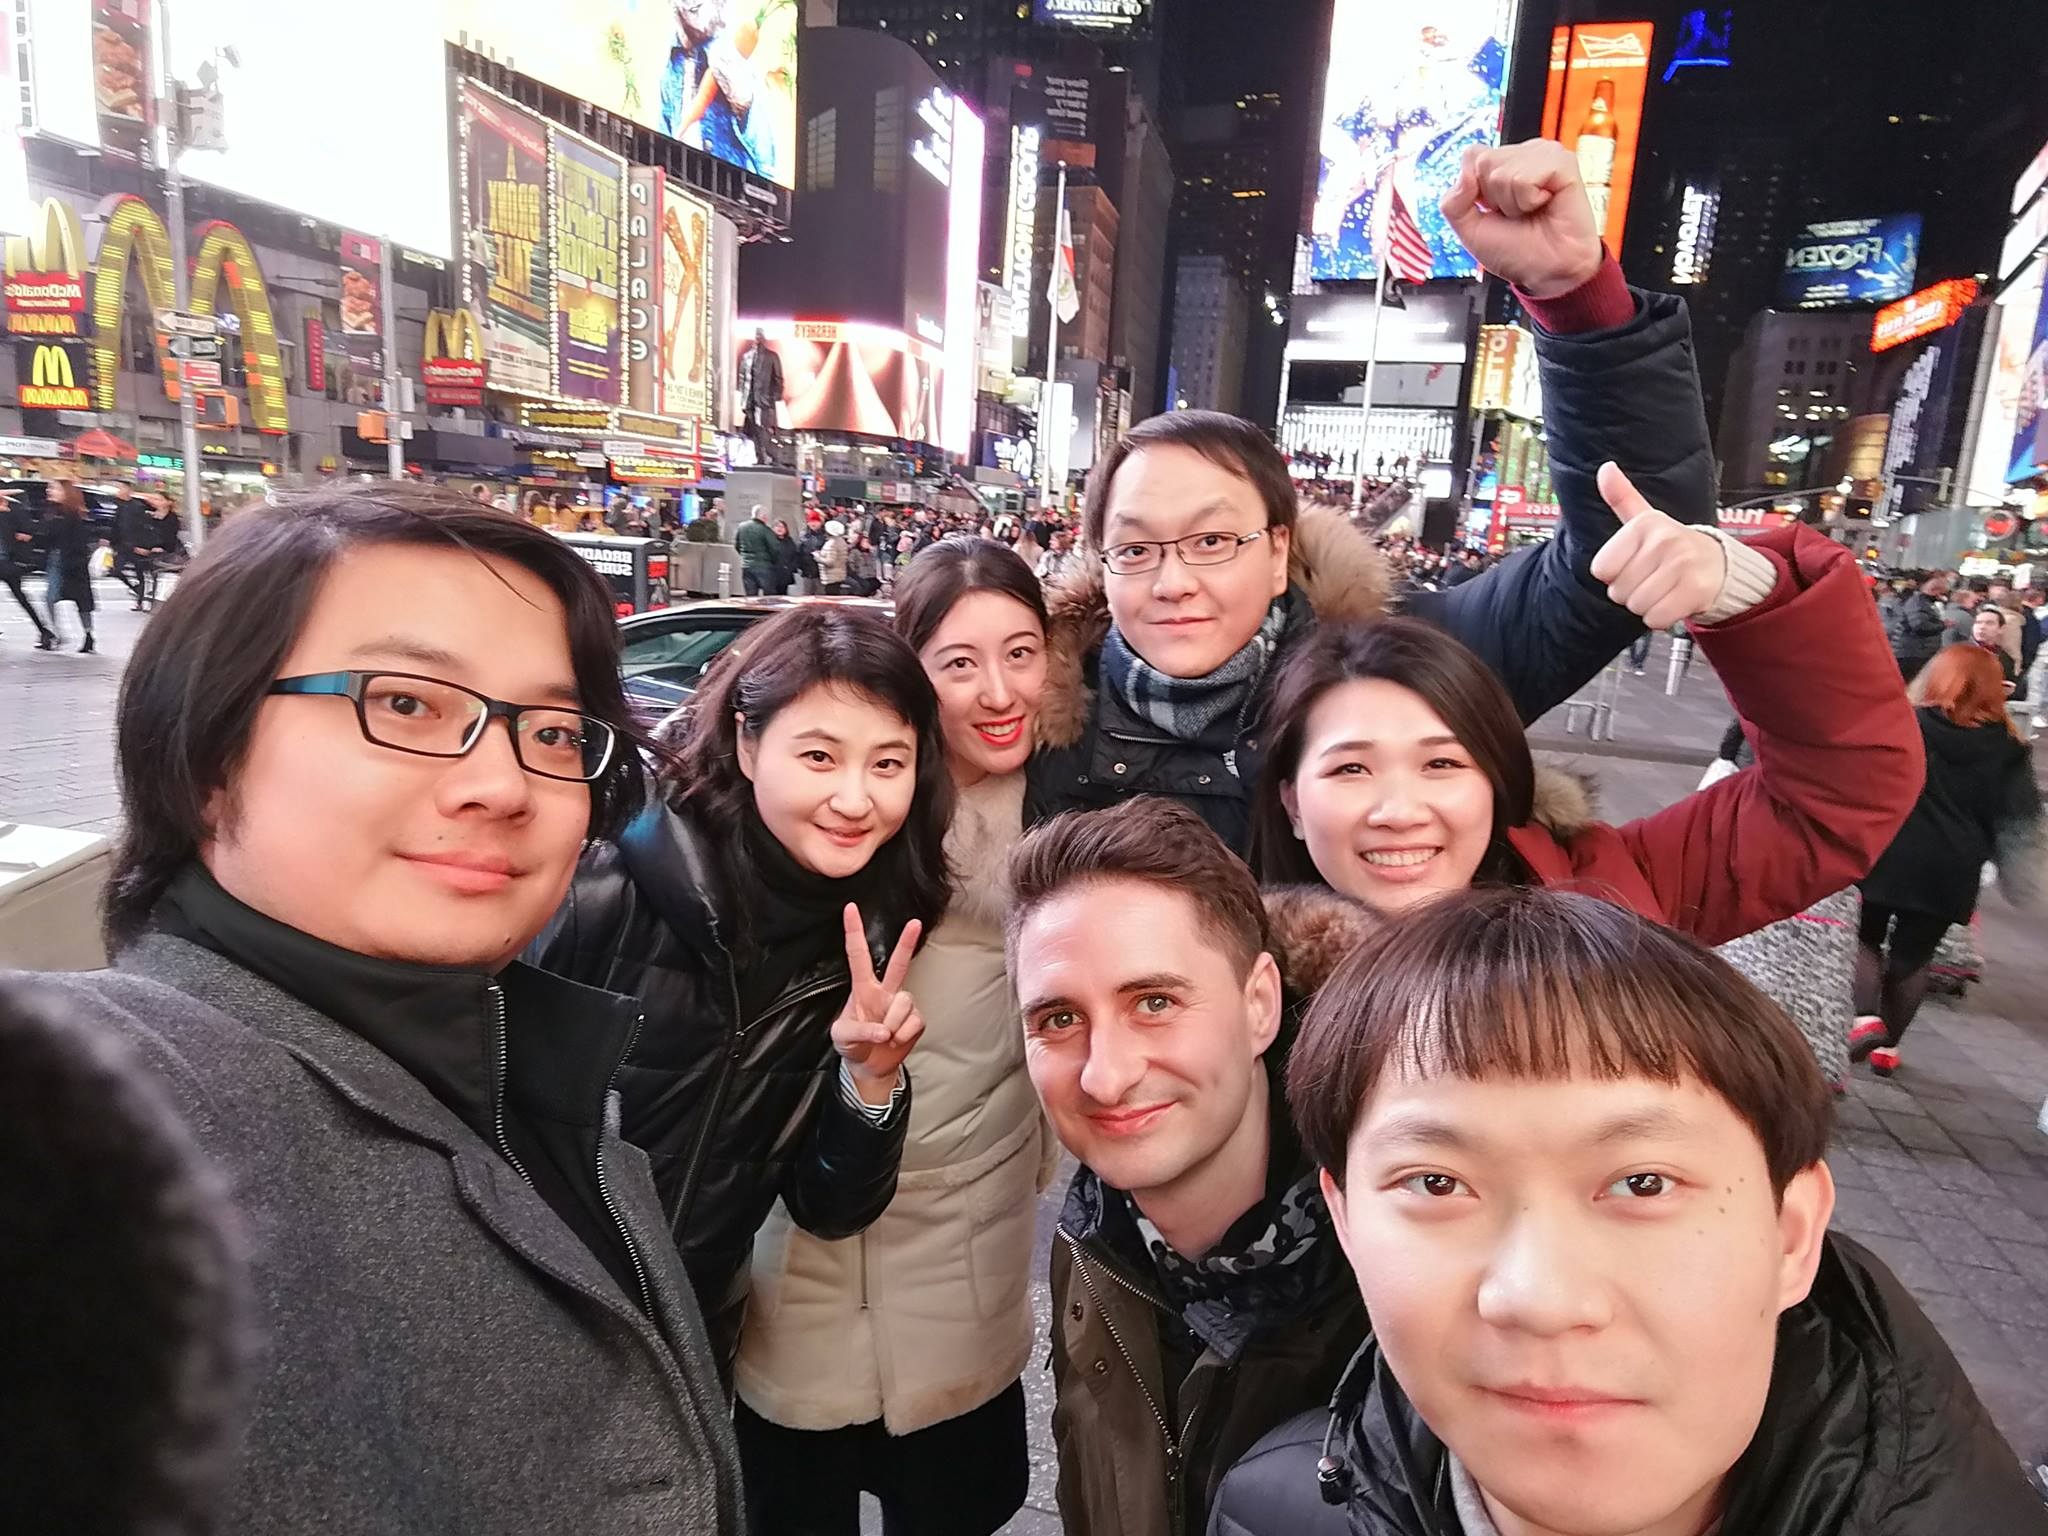 CHINOS EN NEW YORK